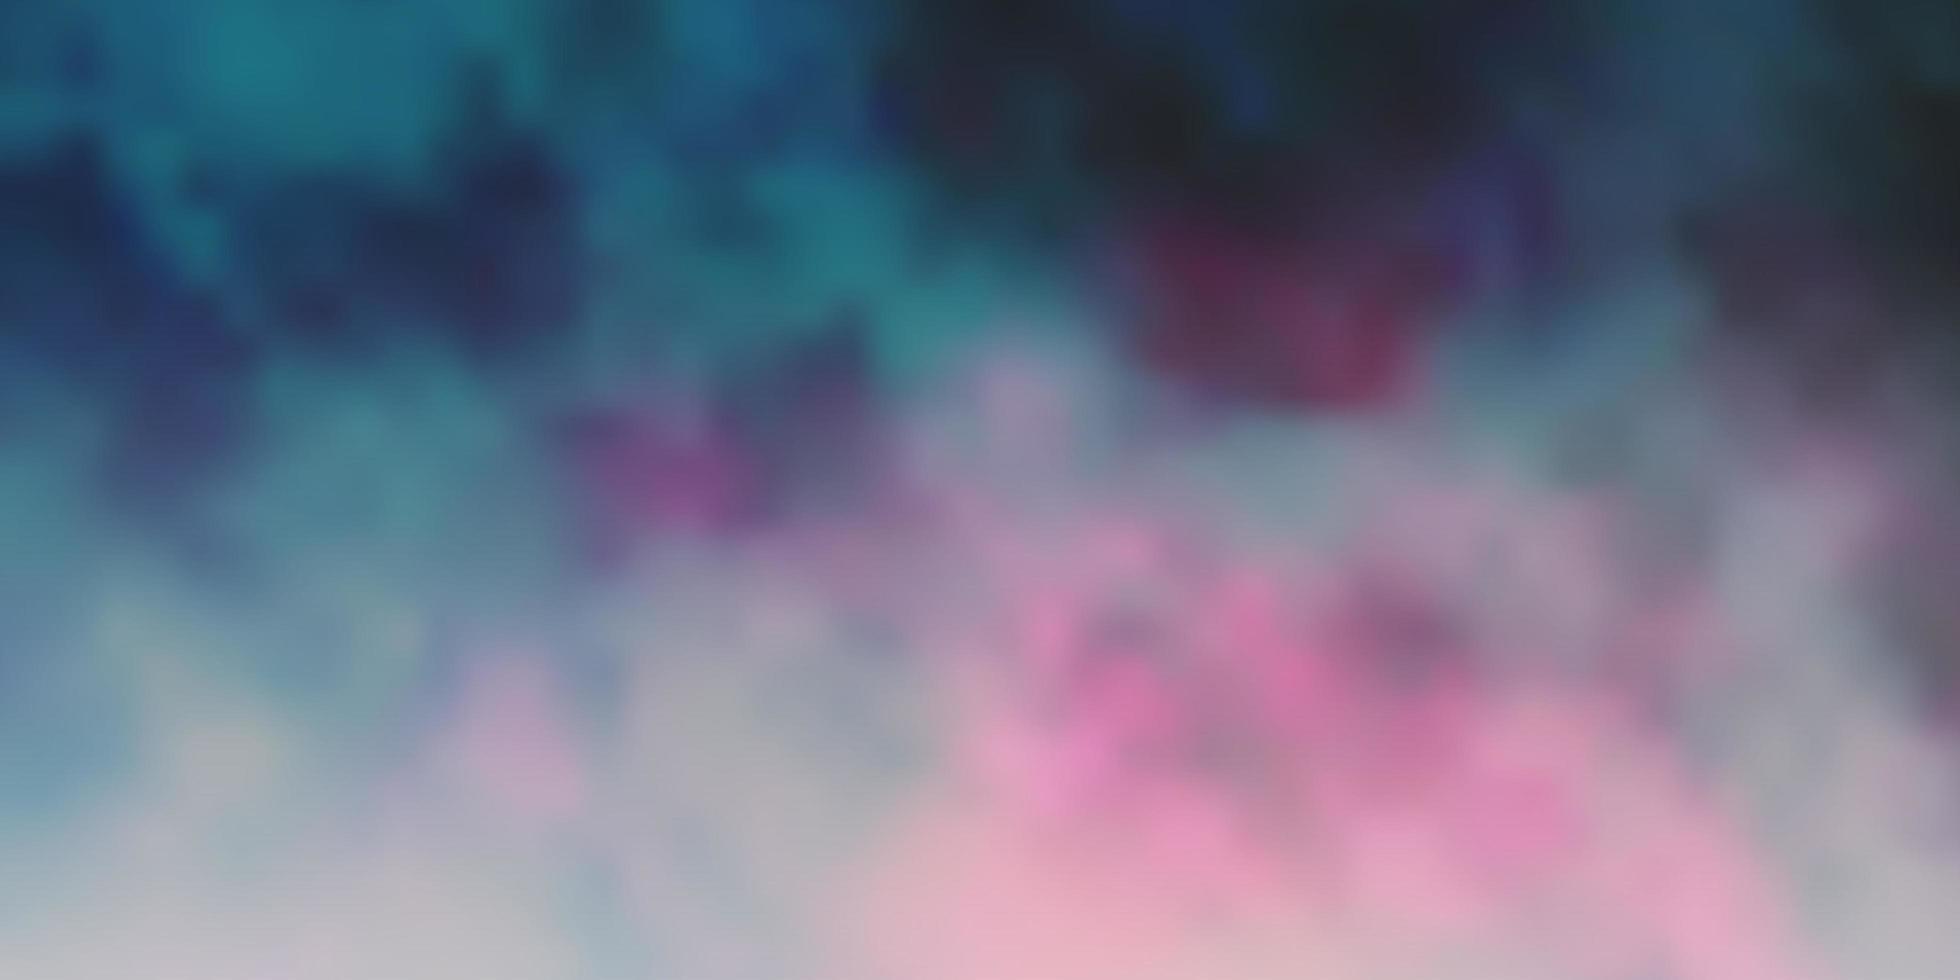 pano de fundo vector rosa escuro com cúmulos.